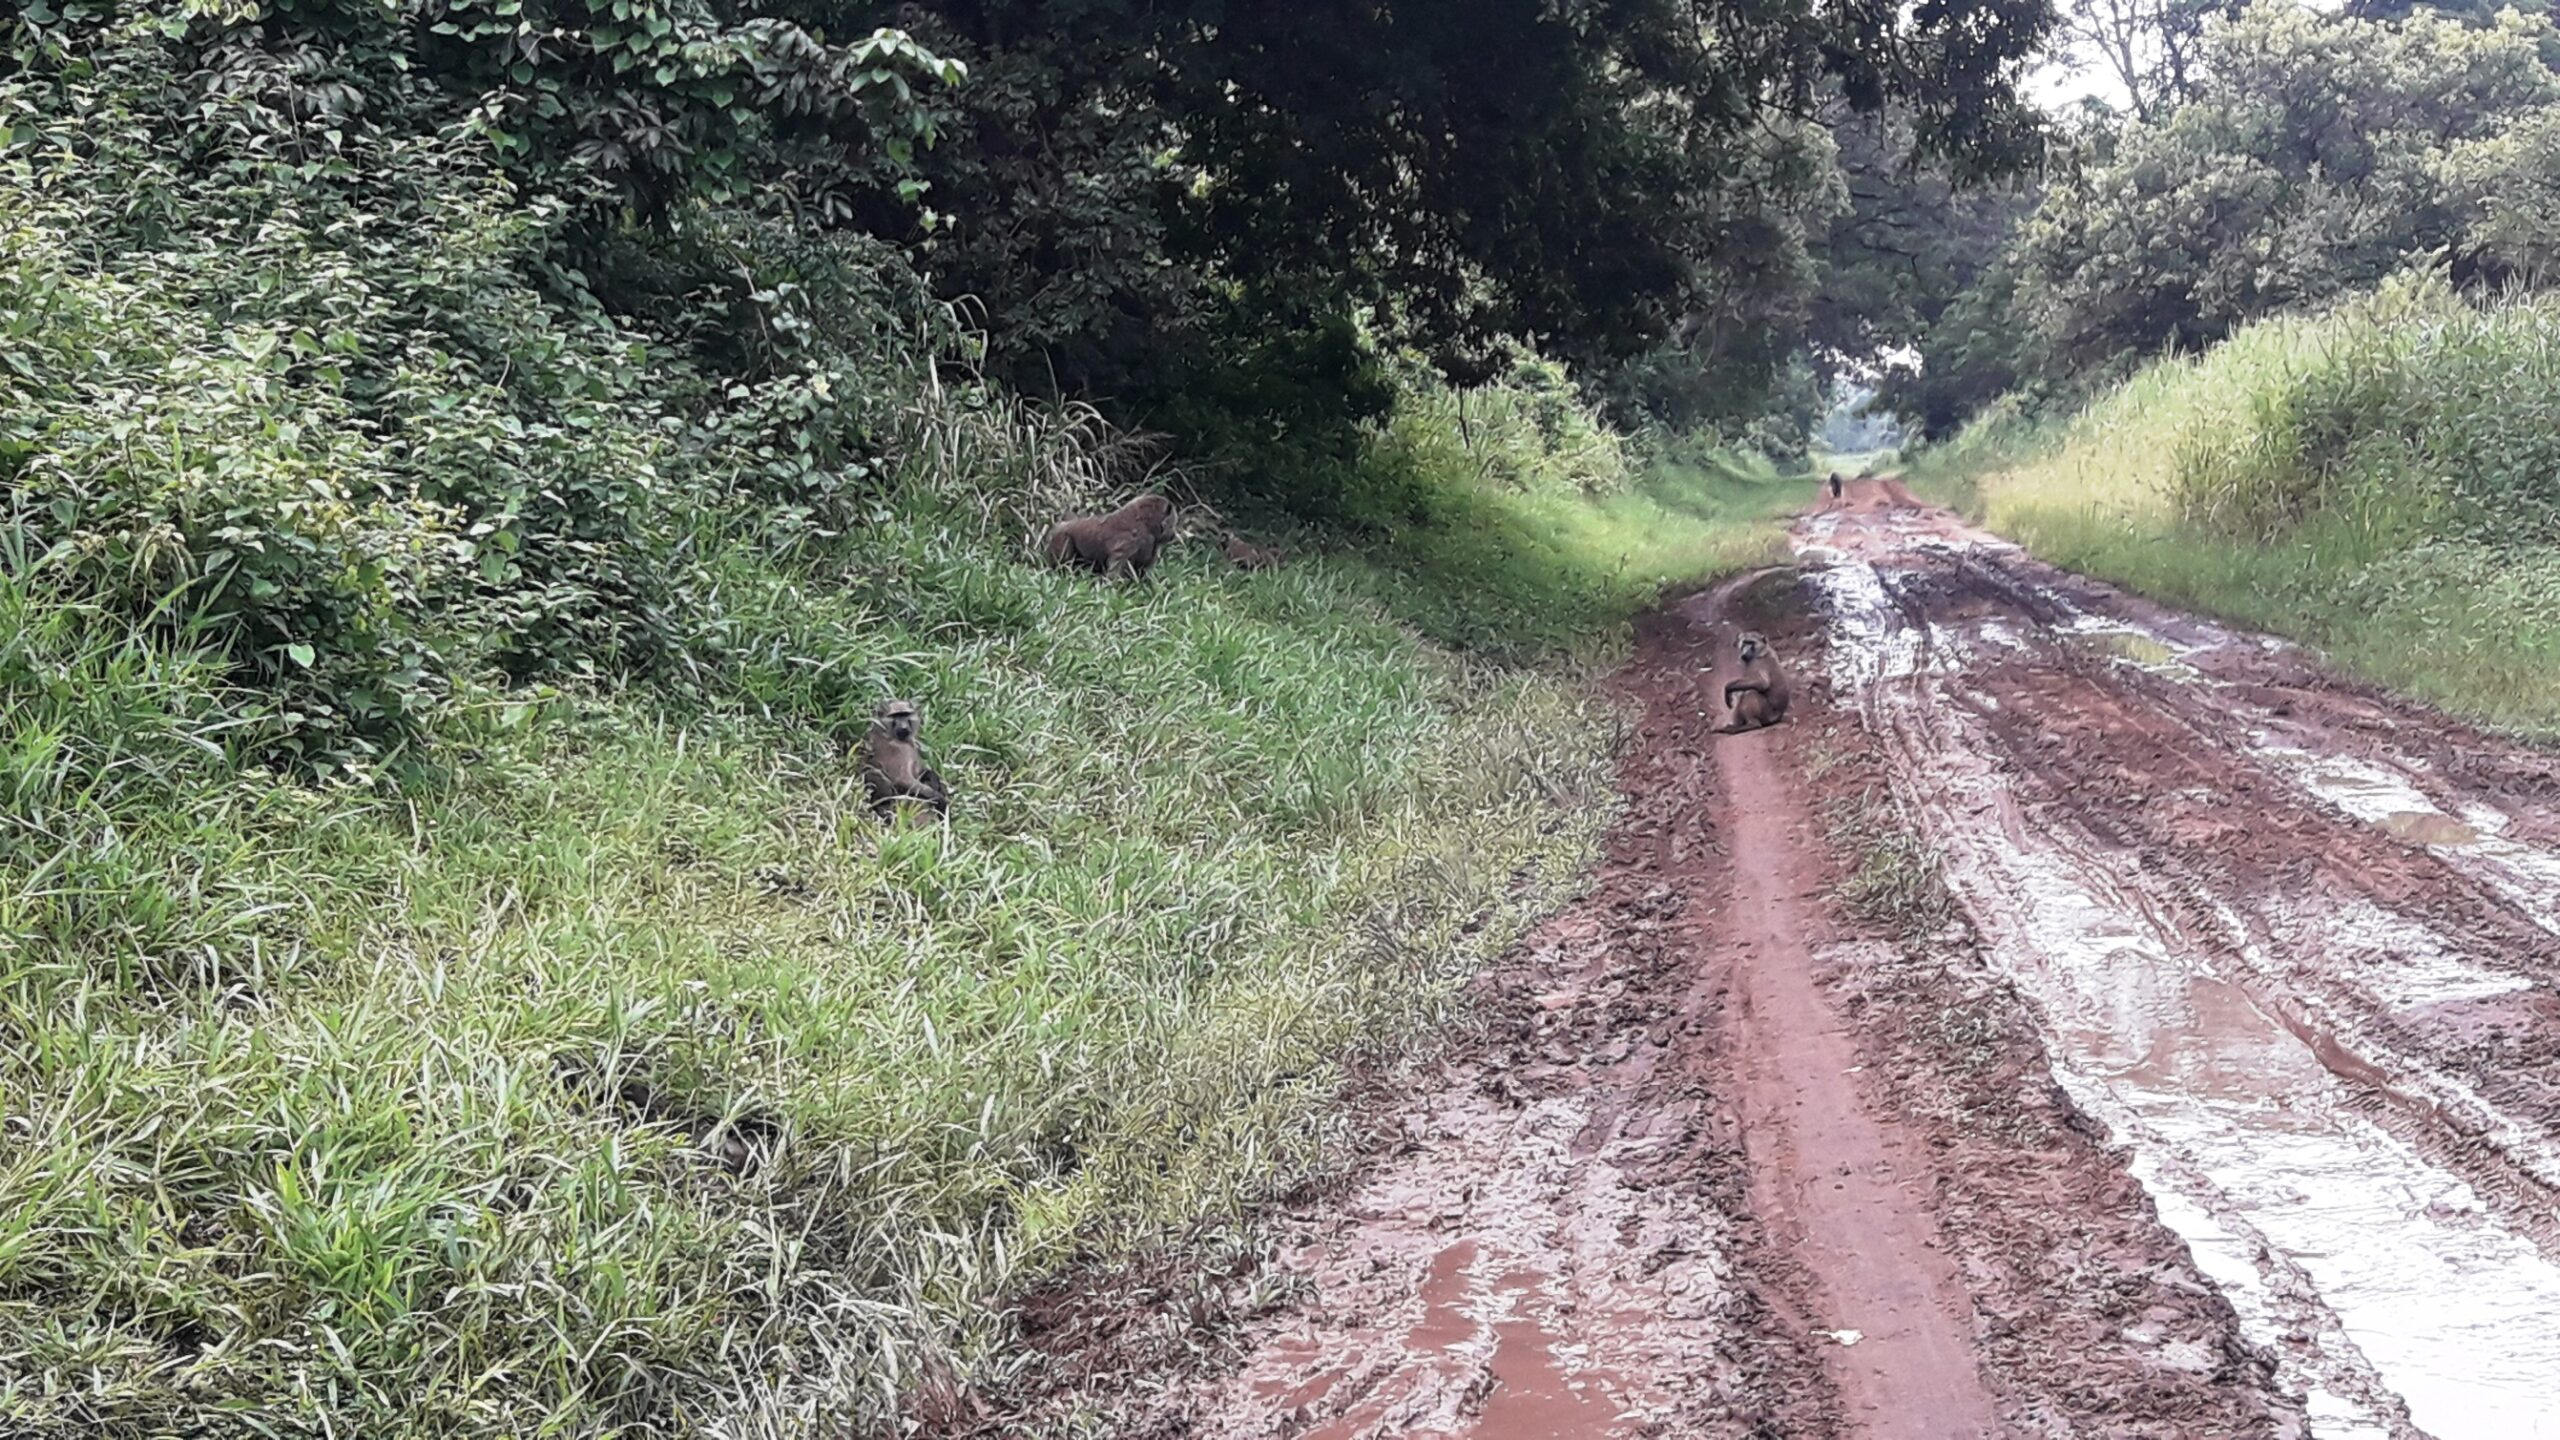 Baboons in Ajai Wildlife Reserve, Uganda